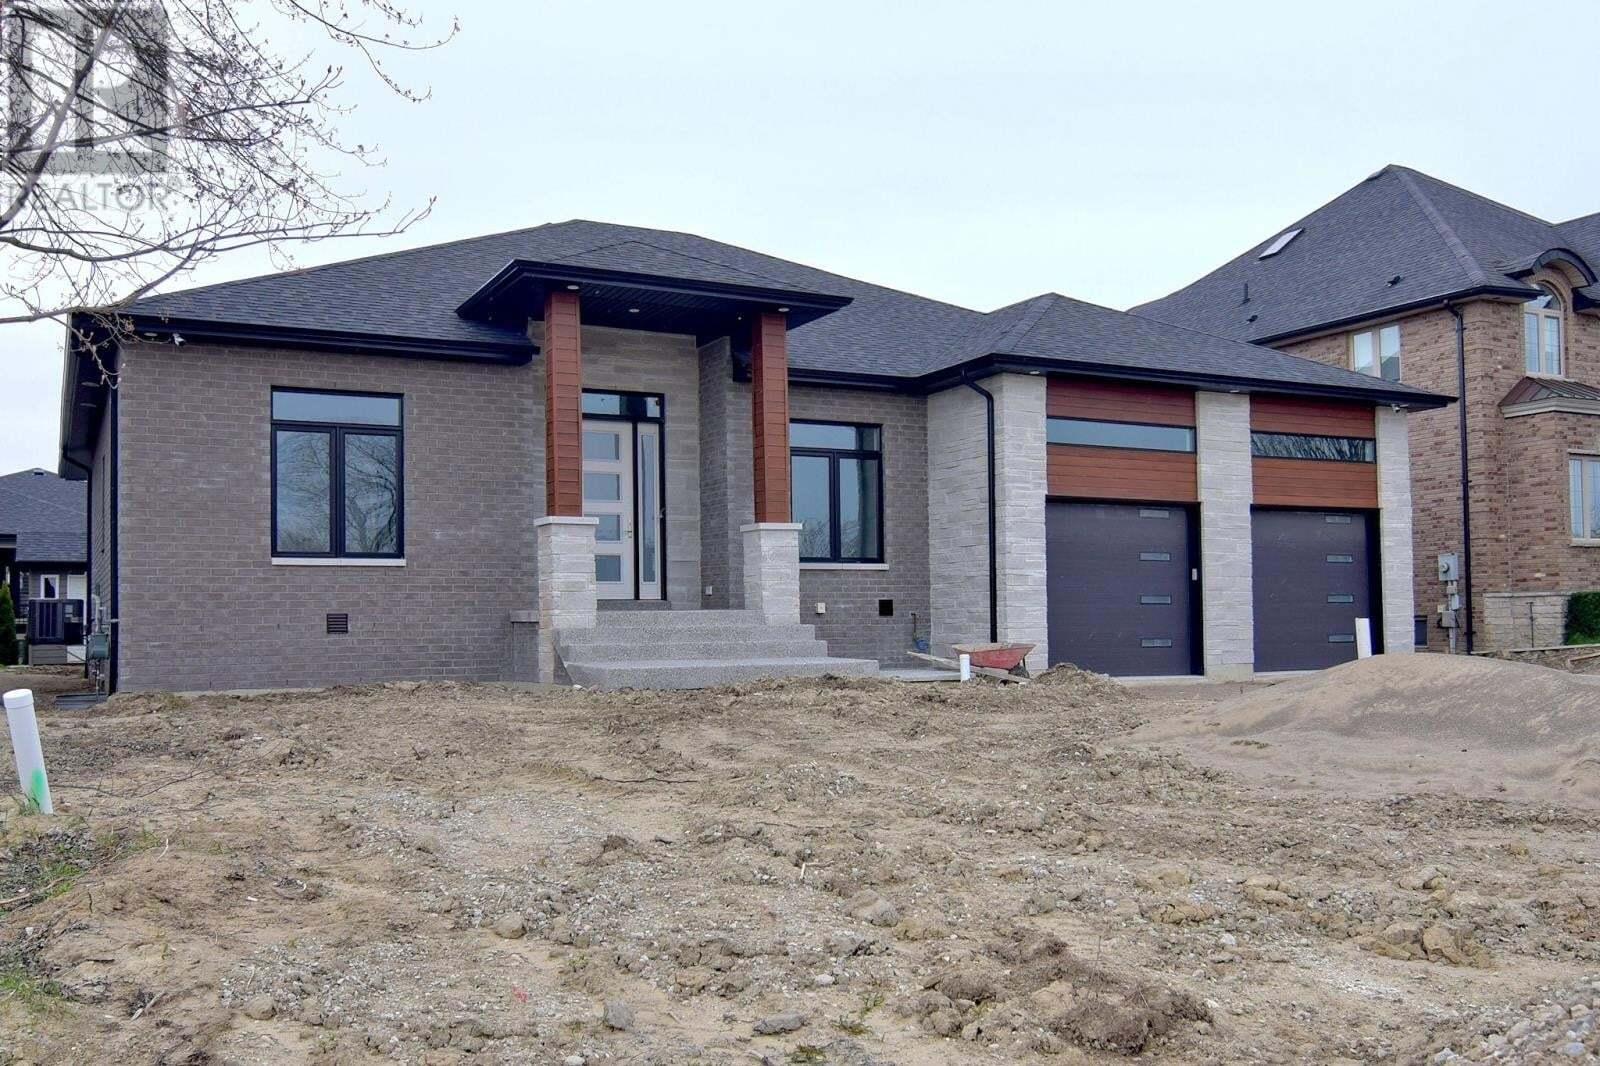 House for sale at 2875 Bridgeway Blvd Lasalle Ontario - MLS: 20004670